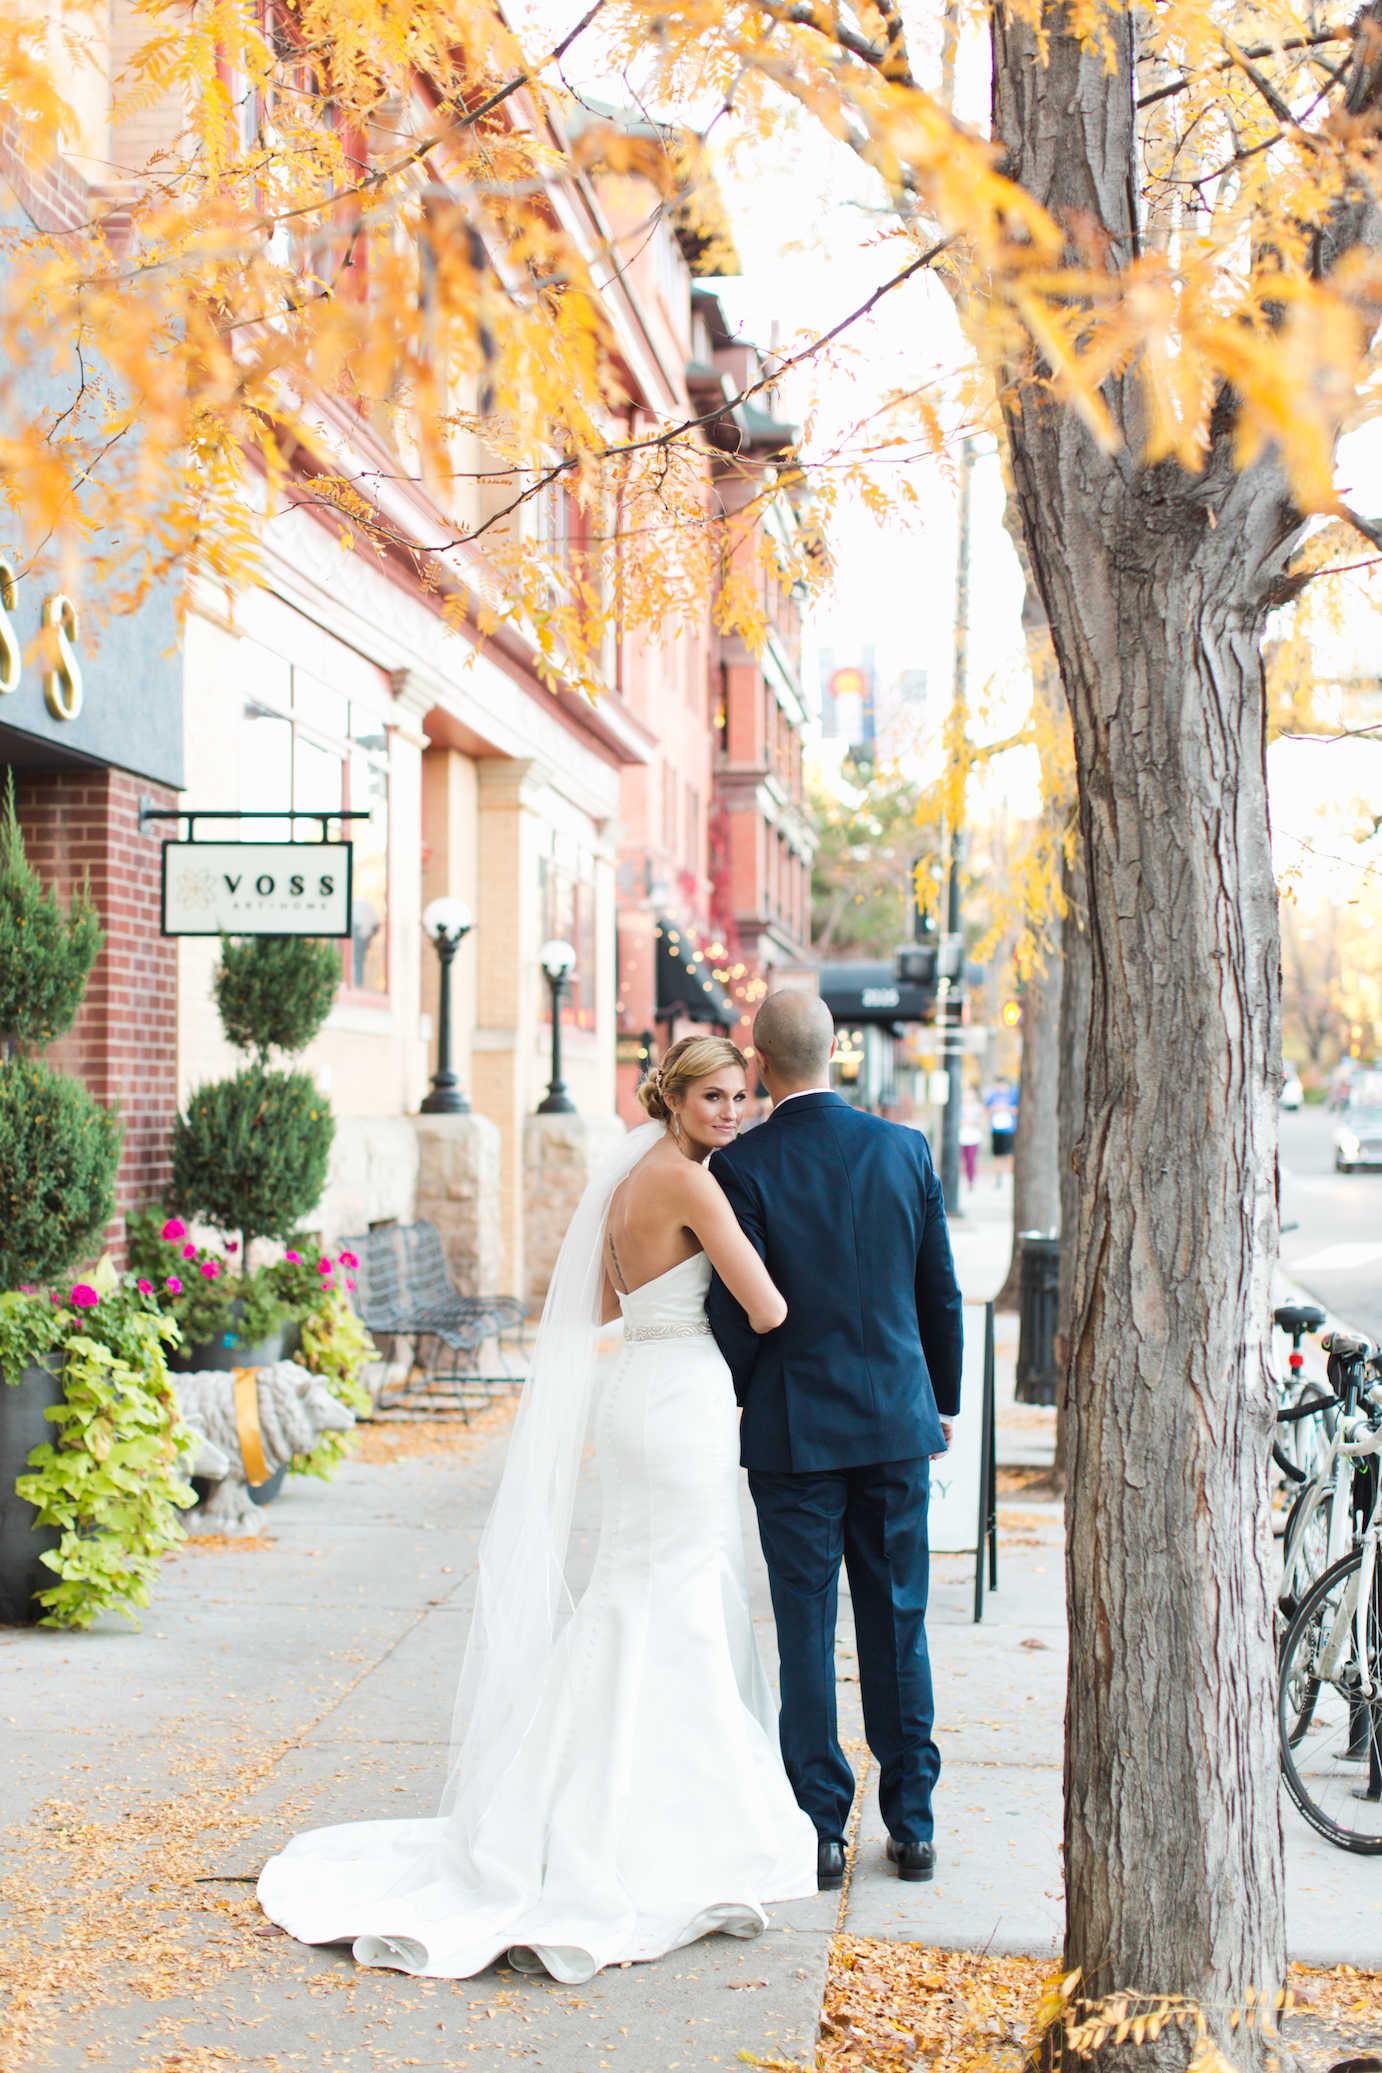 Sophisticated-Gallery-Wedding-in-Boulder-Colorado43.jpg